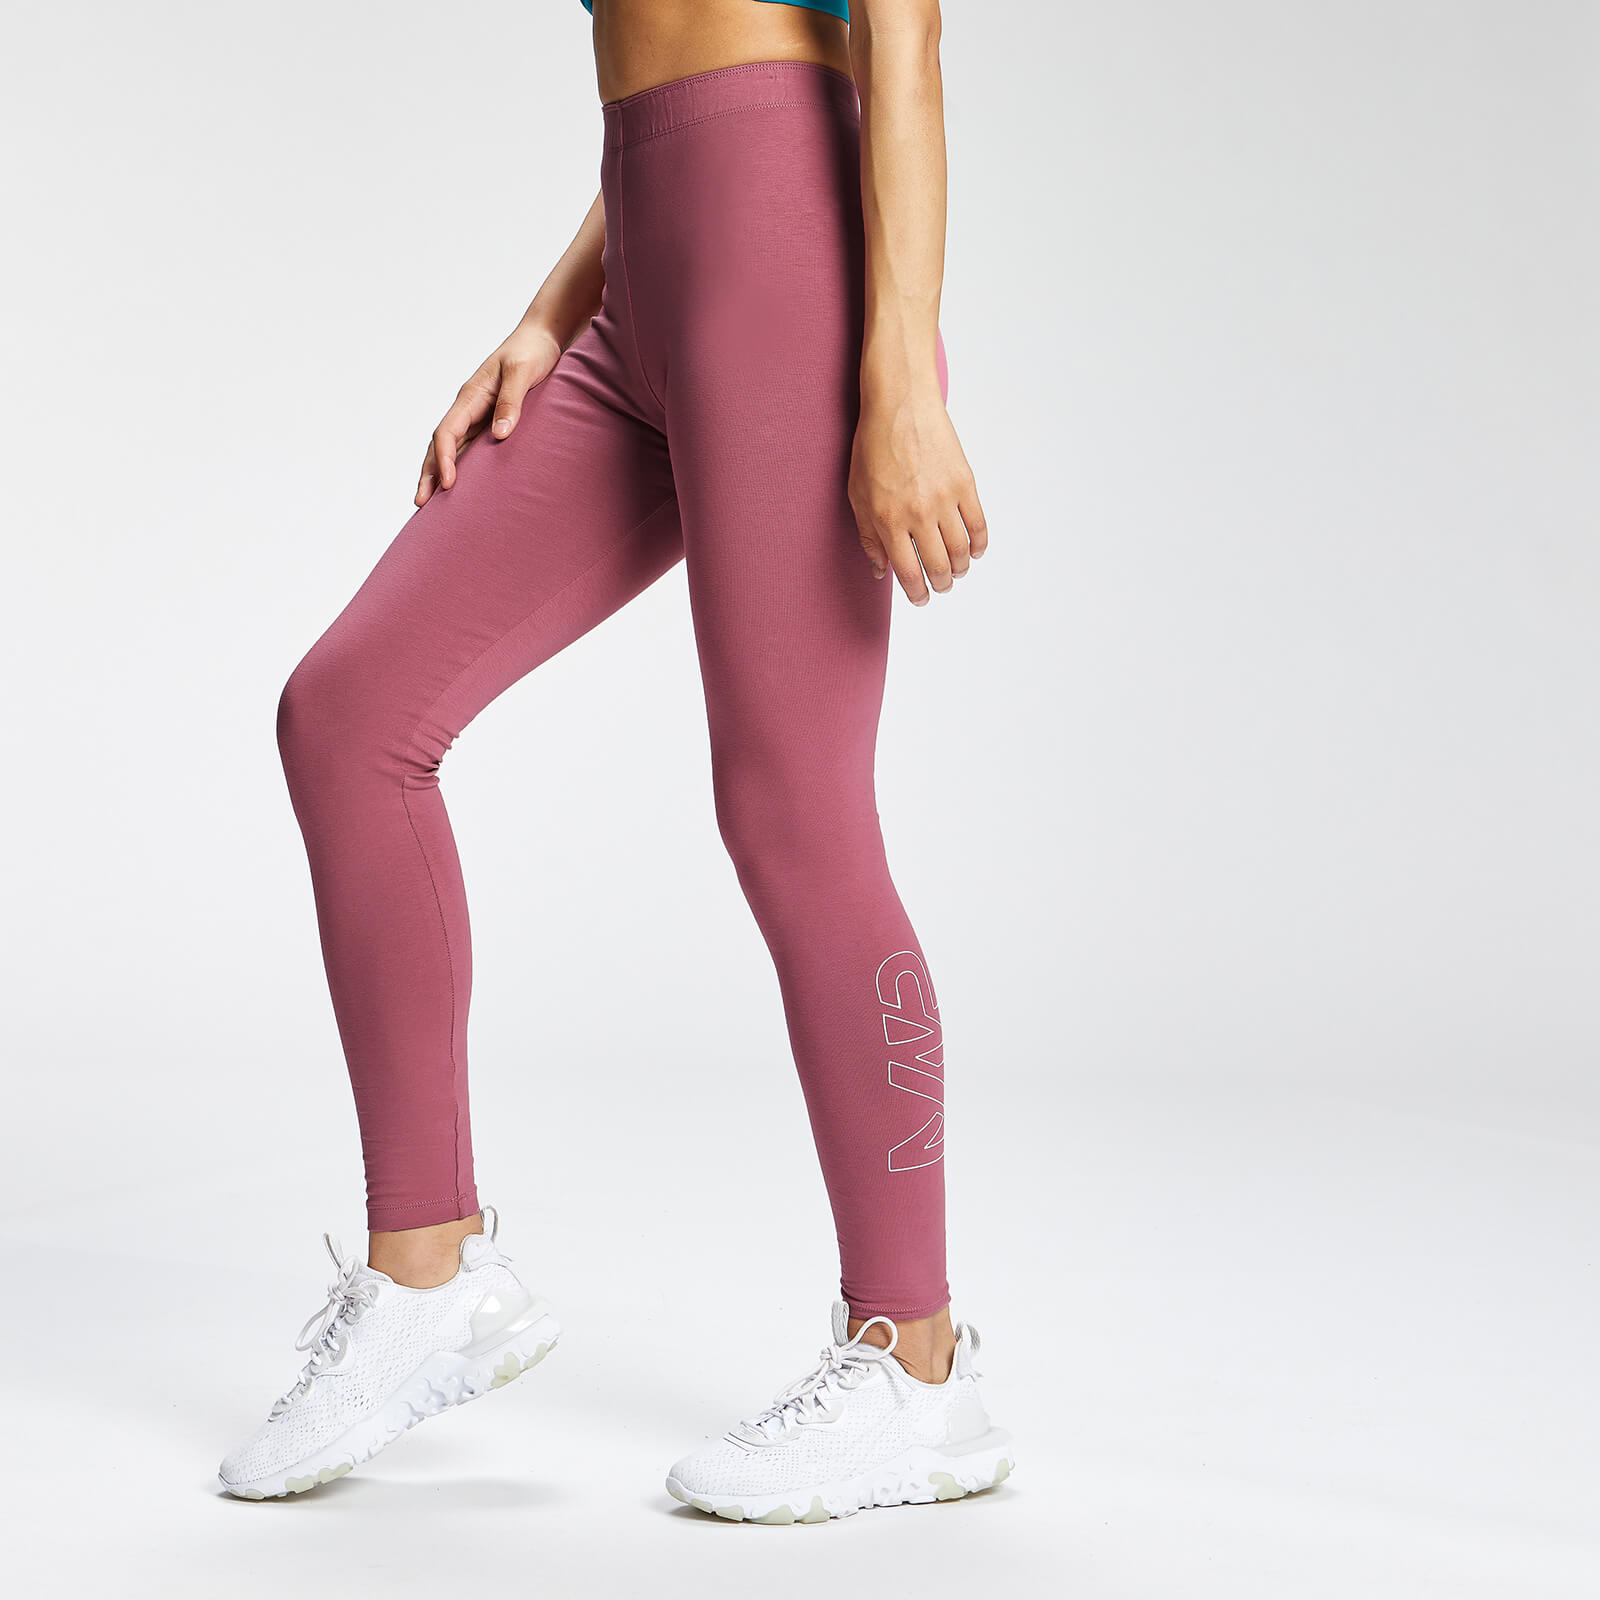 Купить MP Women's Original Jersey Leggings - Frosted Berry - XL, Myprotein International